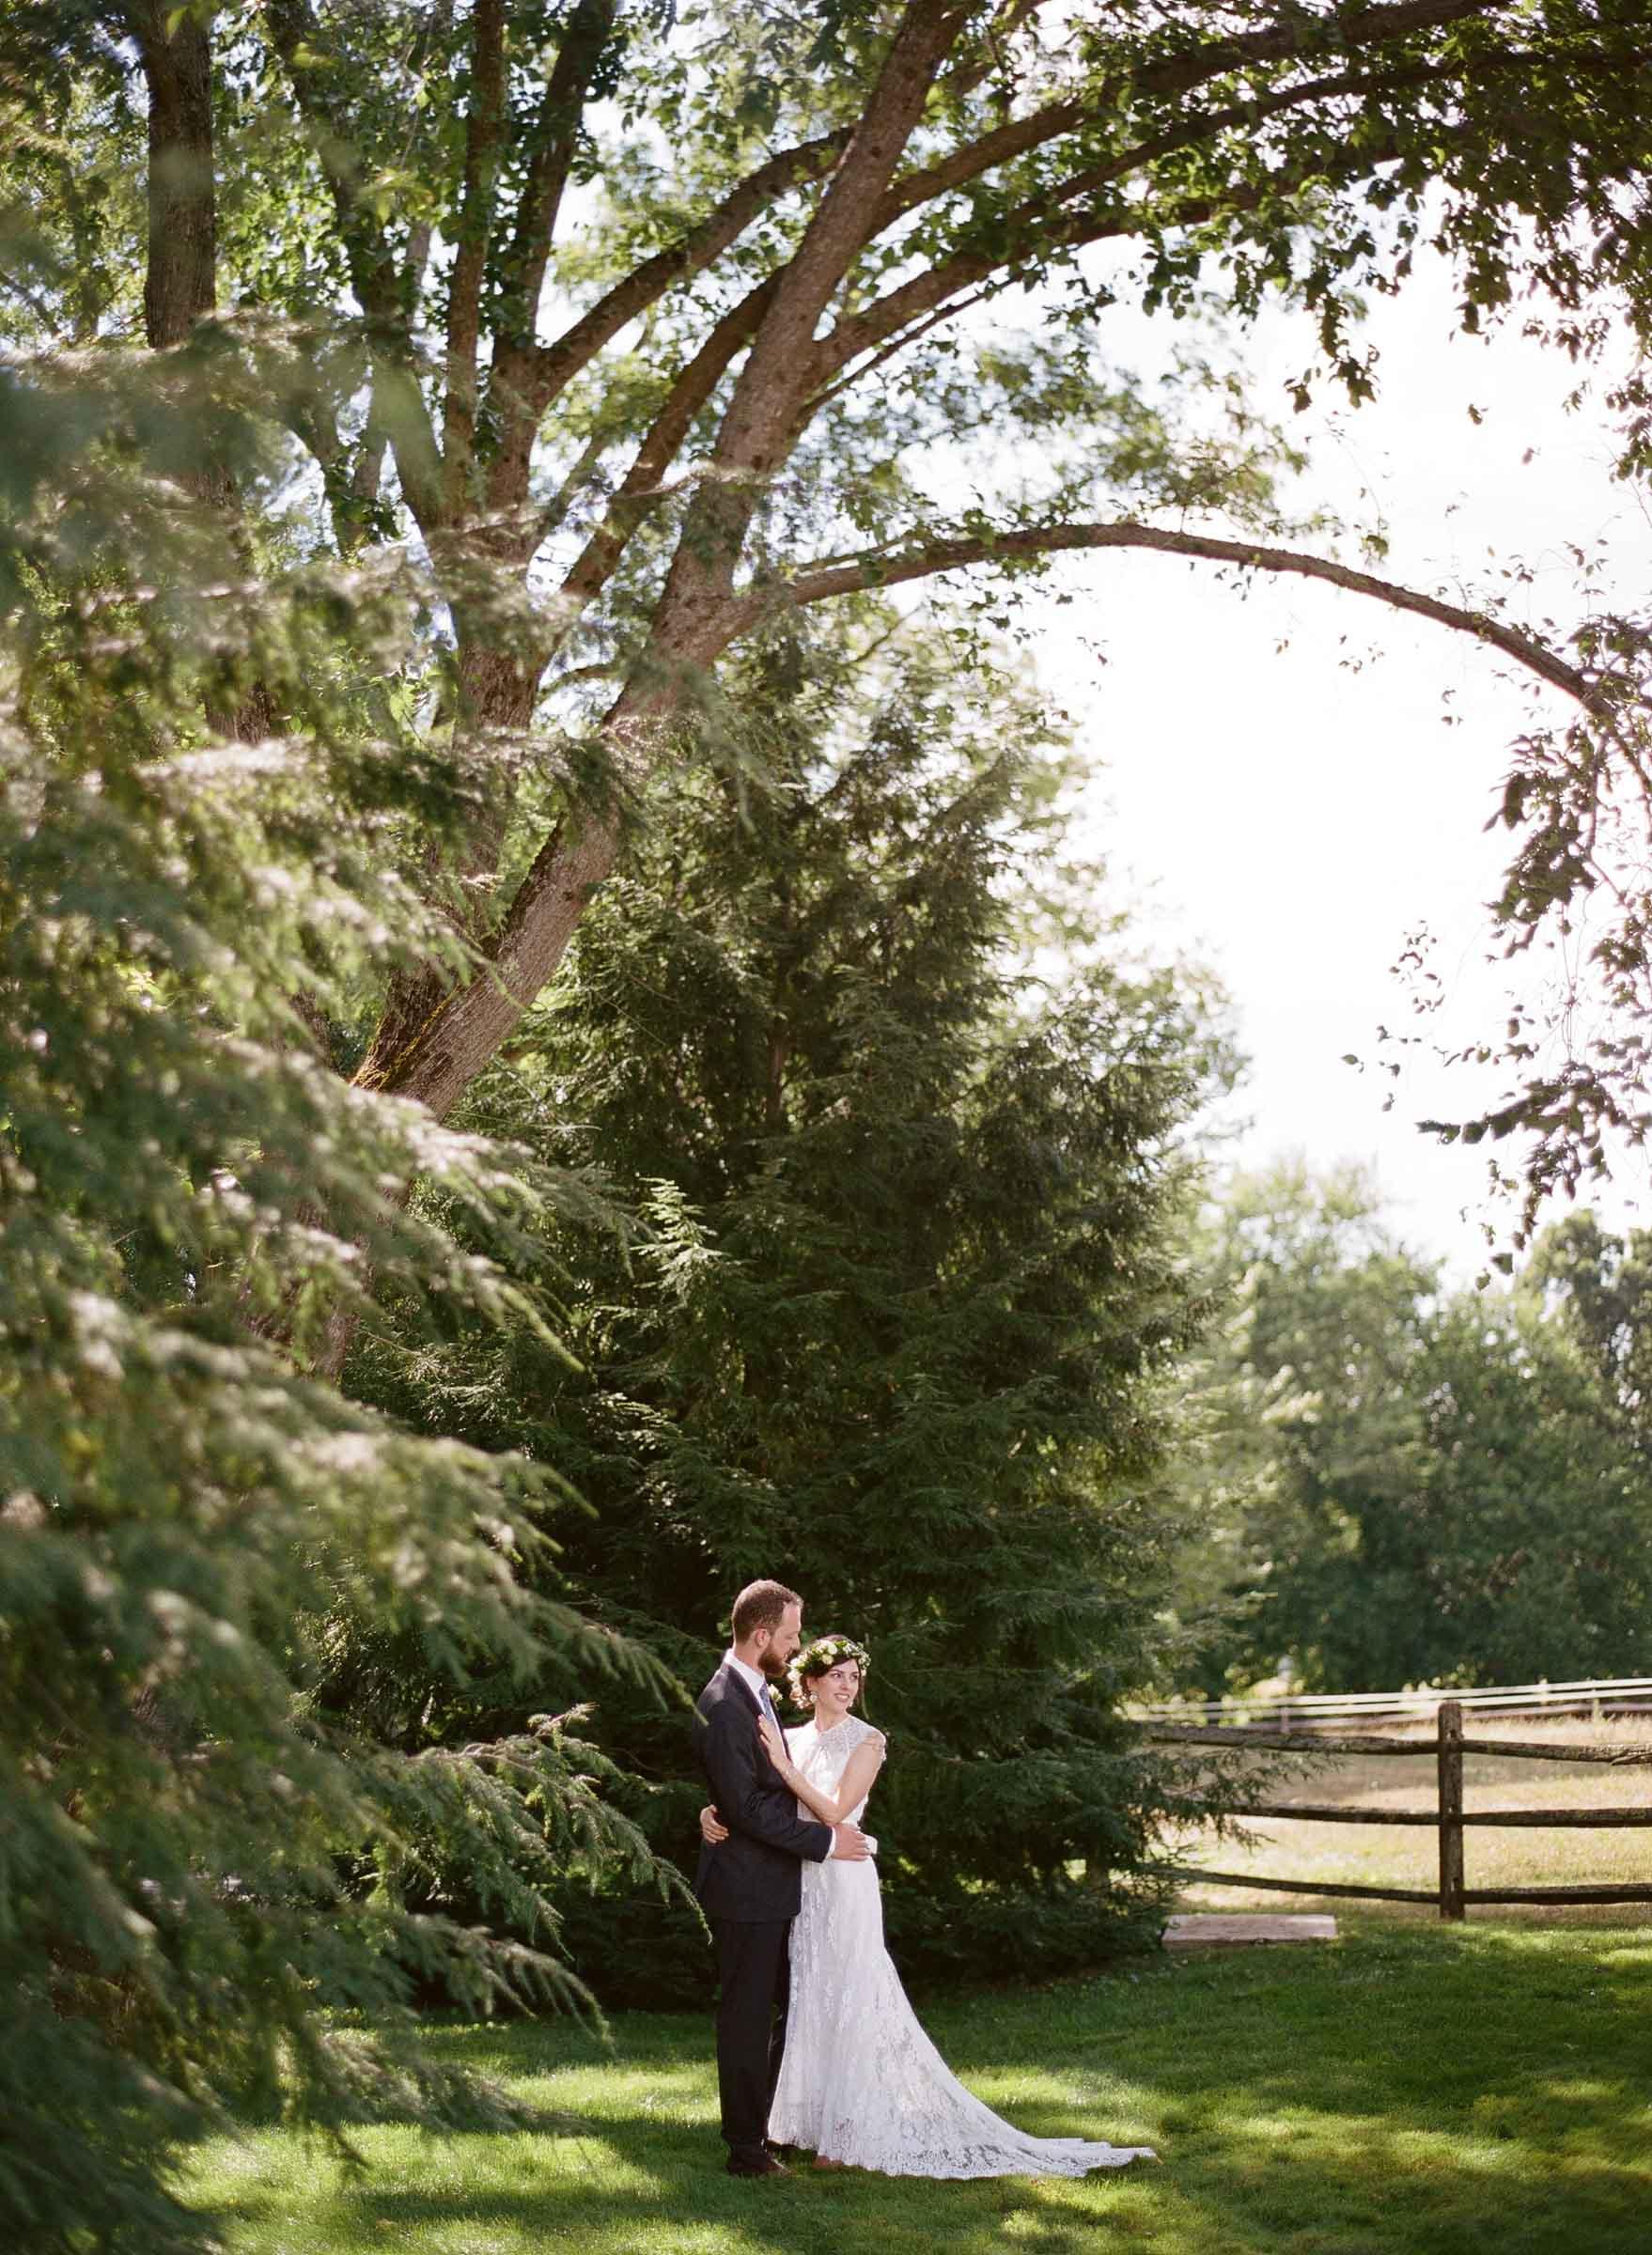 Concord-Wedding-Photography-46.jpg